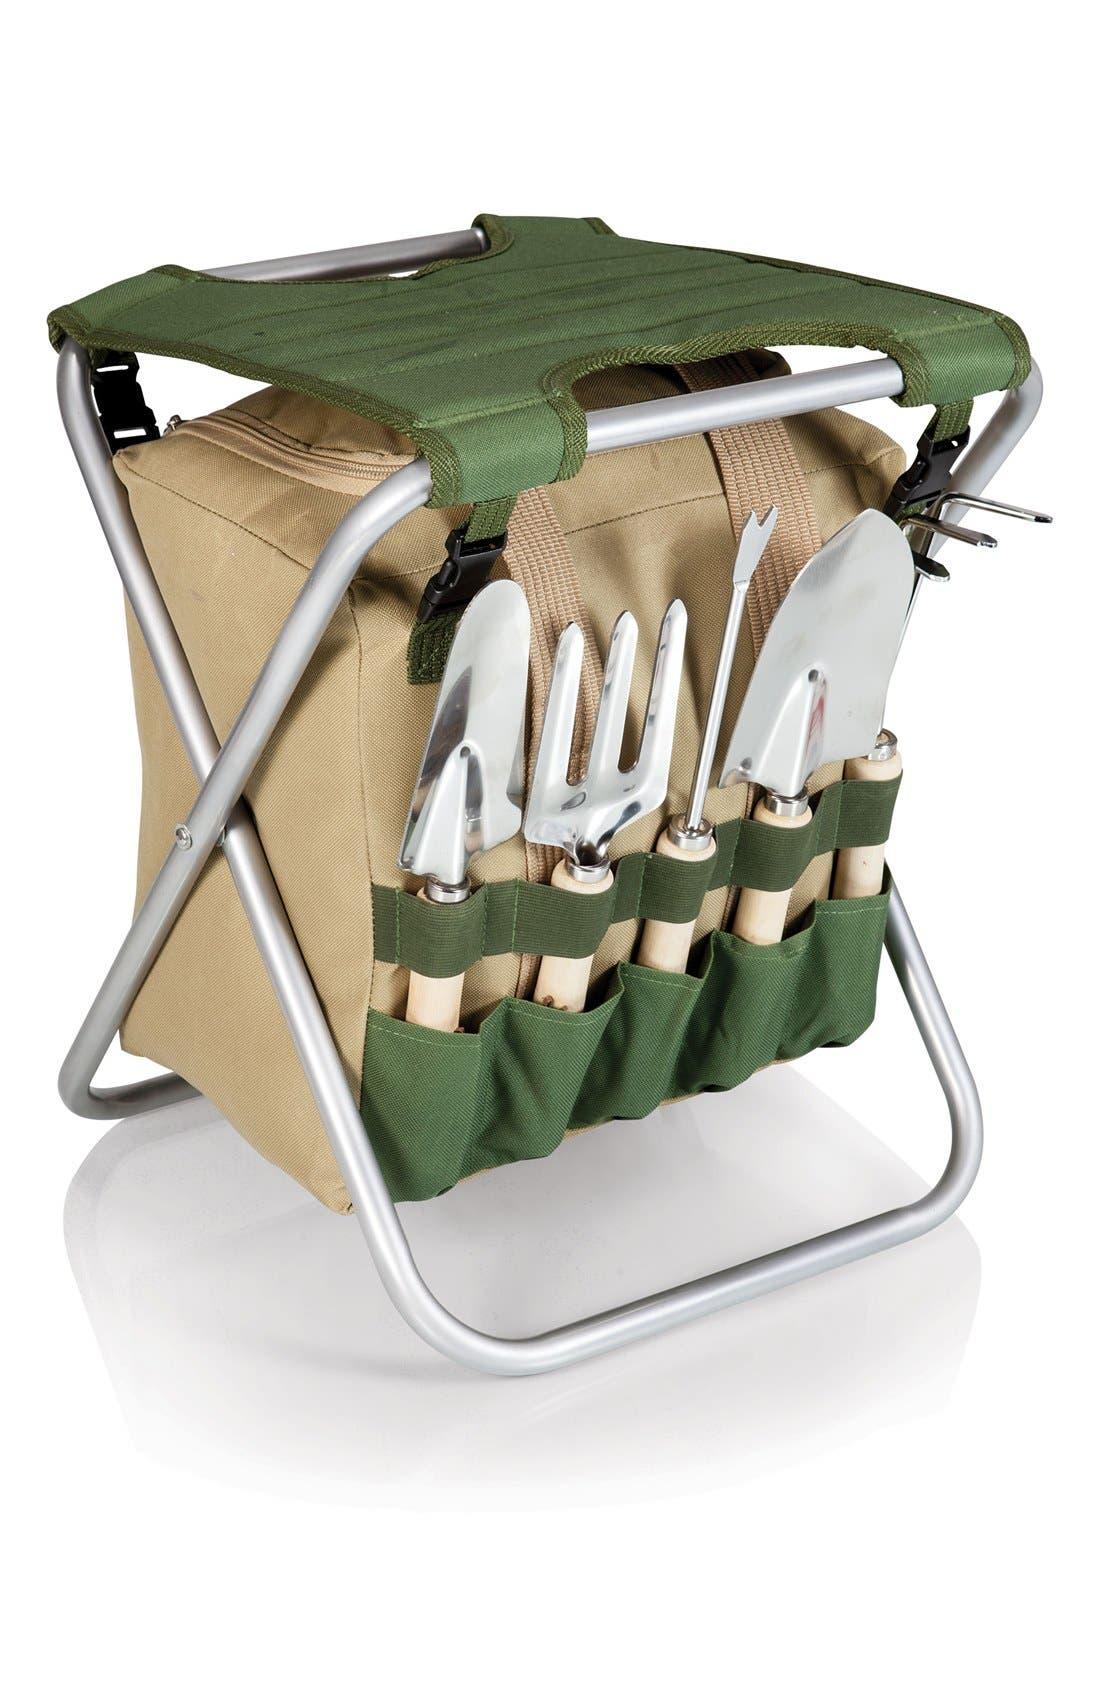 Picnic Time Gardener Seat & Tools,                             Main thumbnail 1, color,                             300